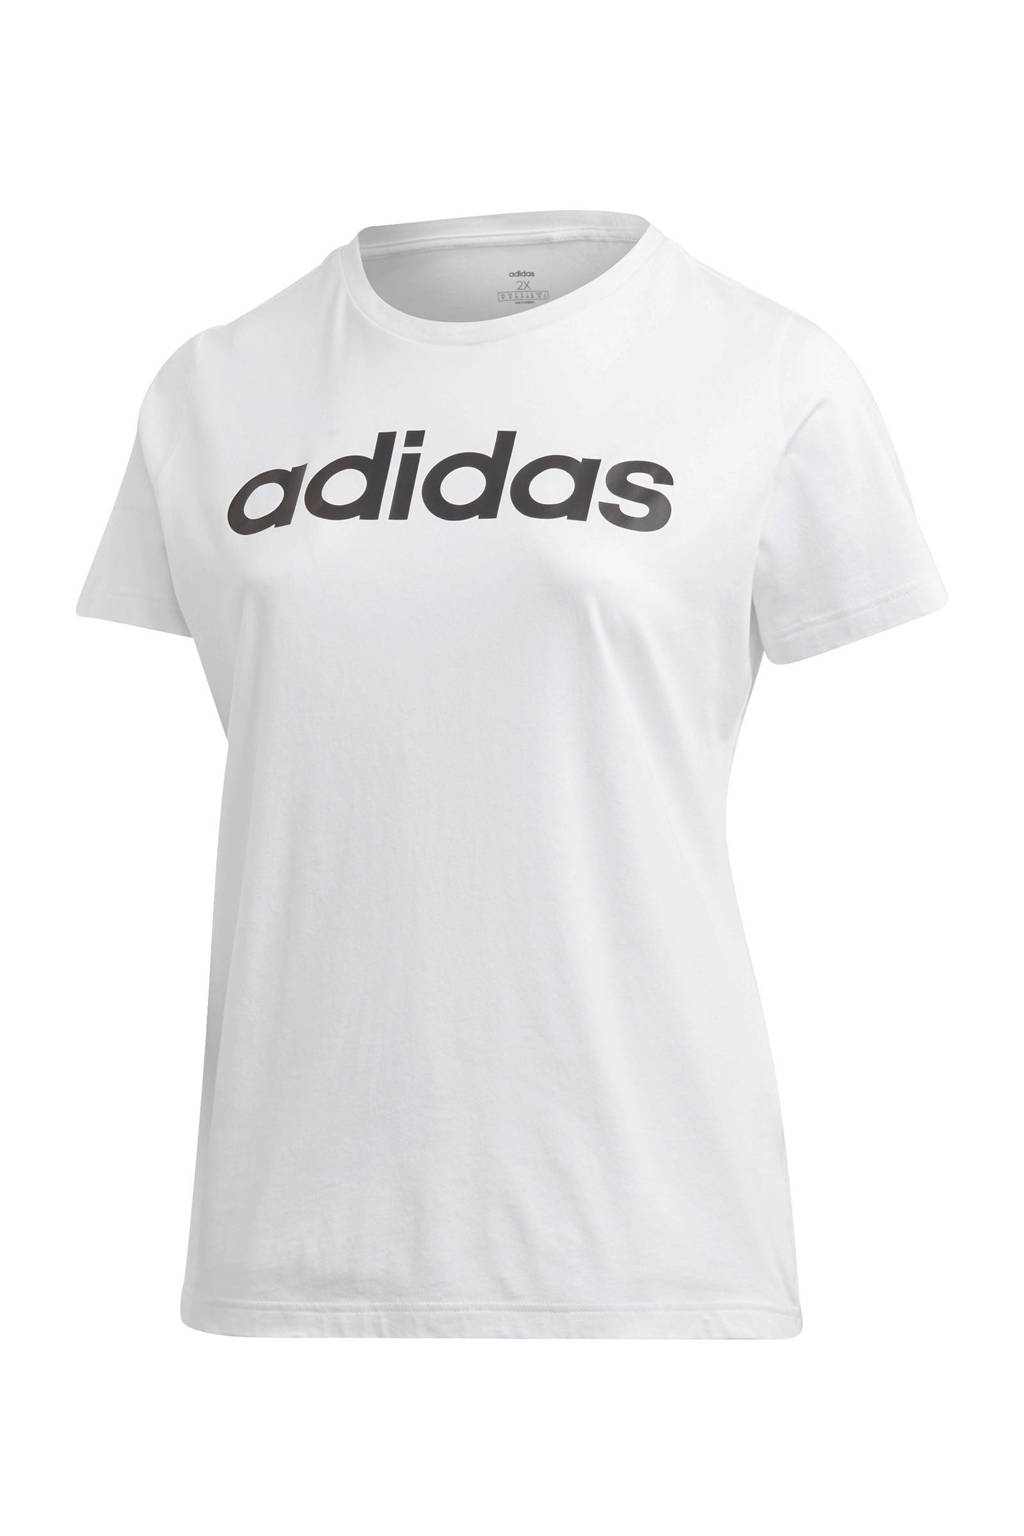 adidas Performance Plus Size sport T-shirt  wit/zwart, Wit/zwart